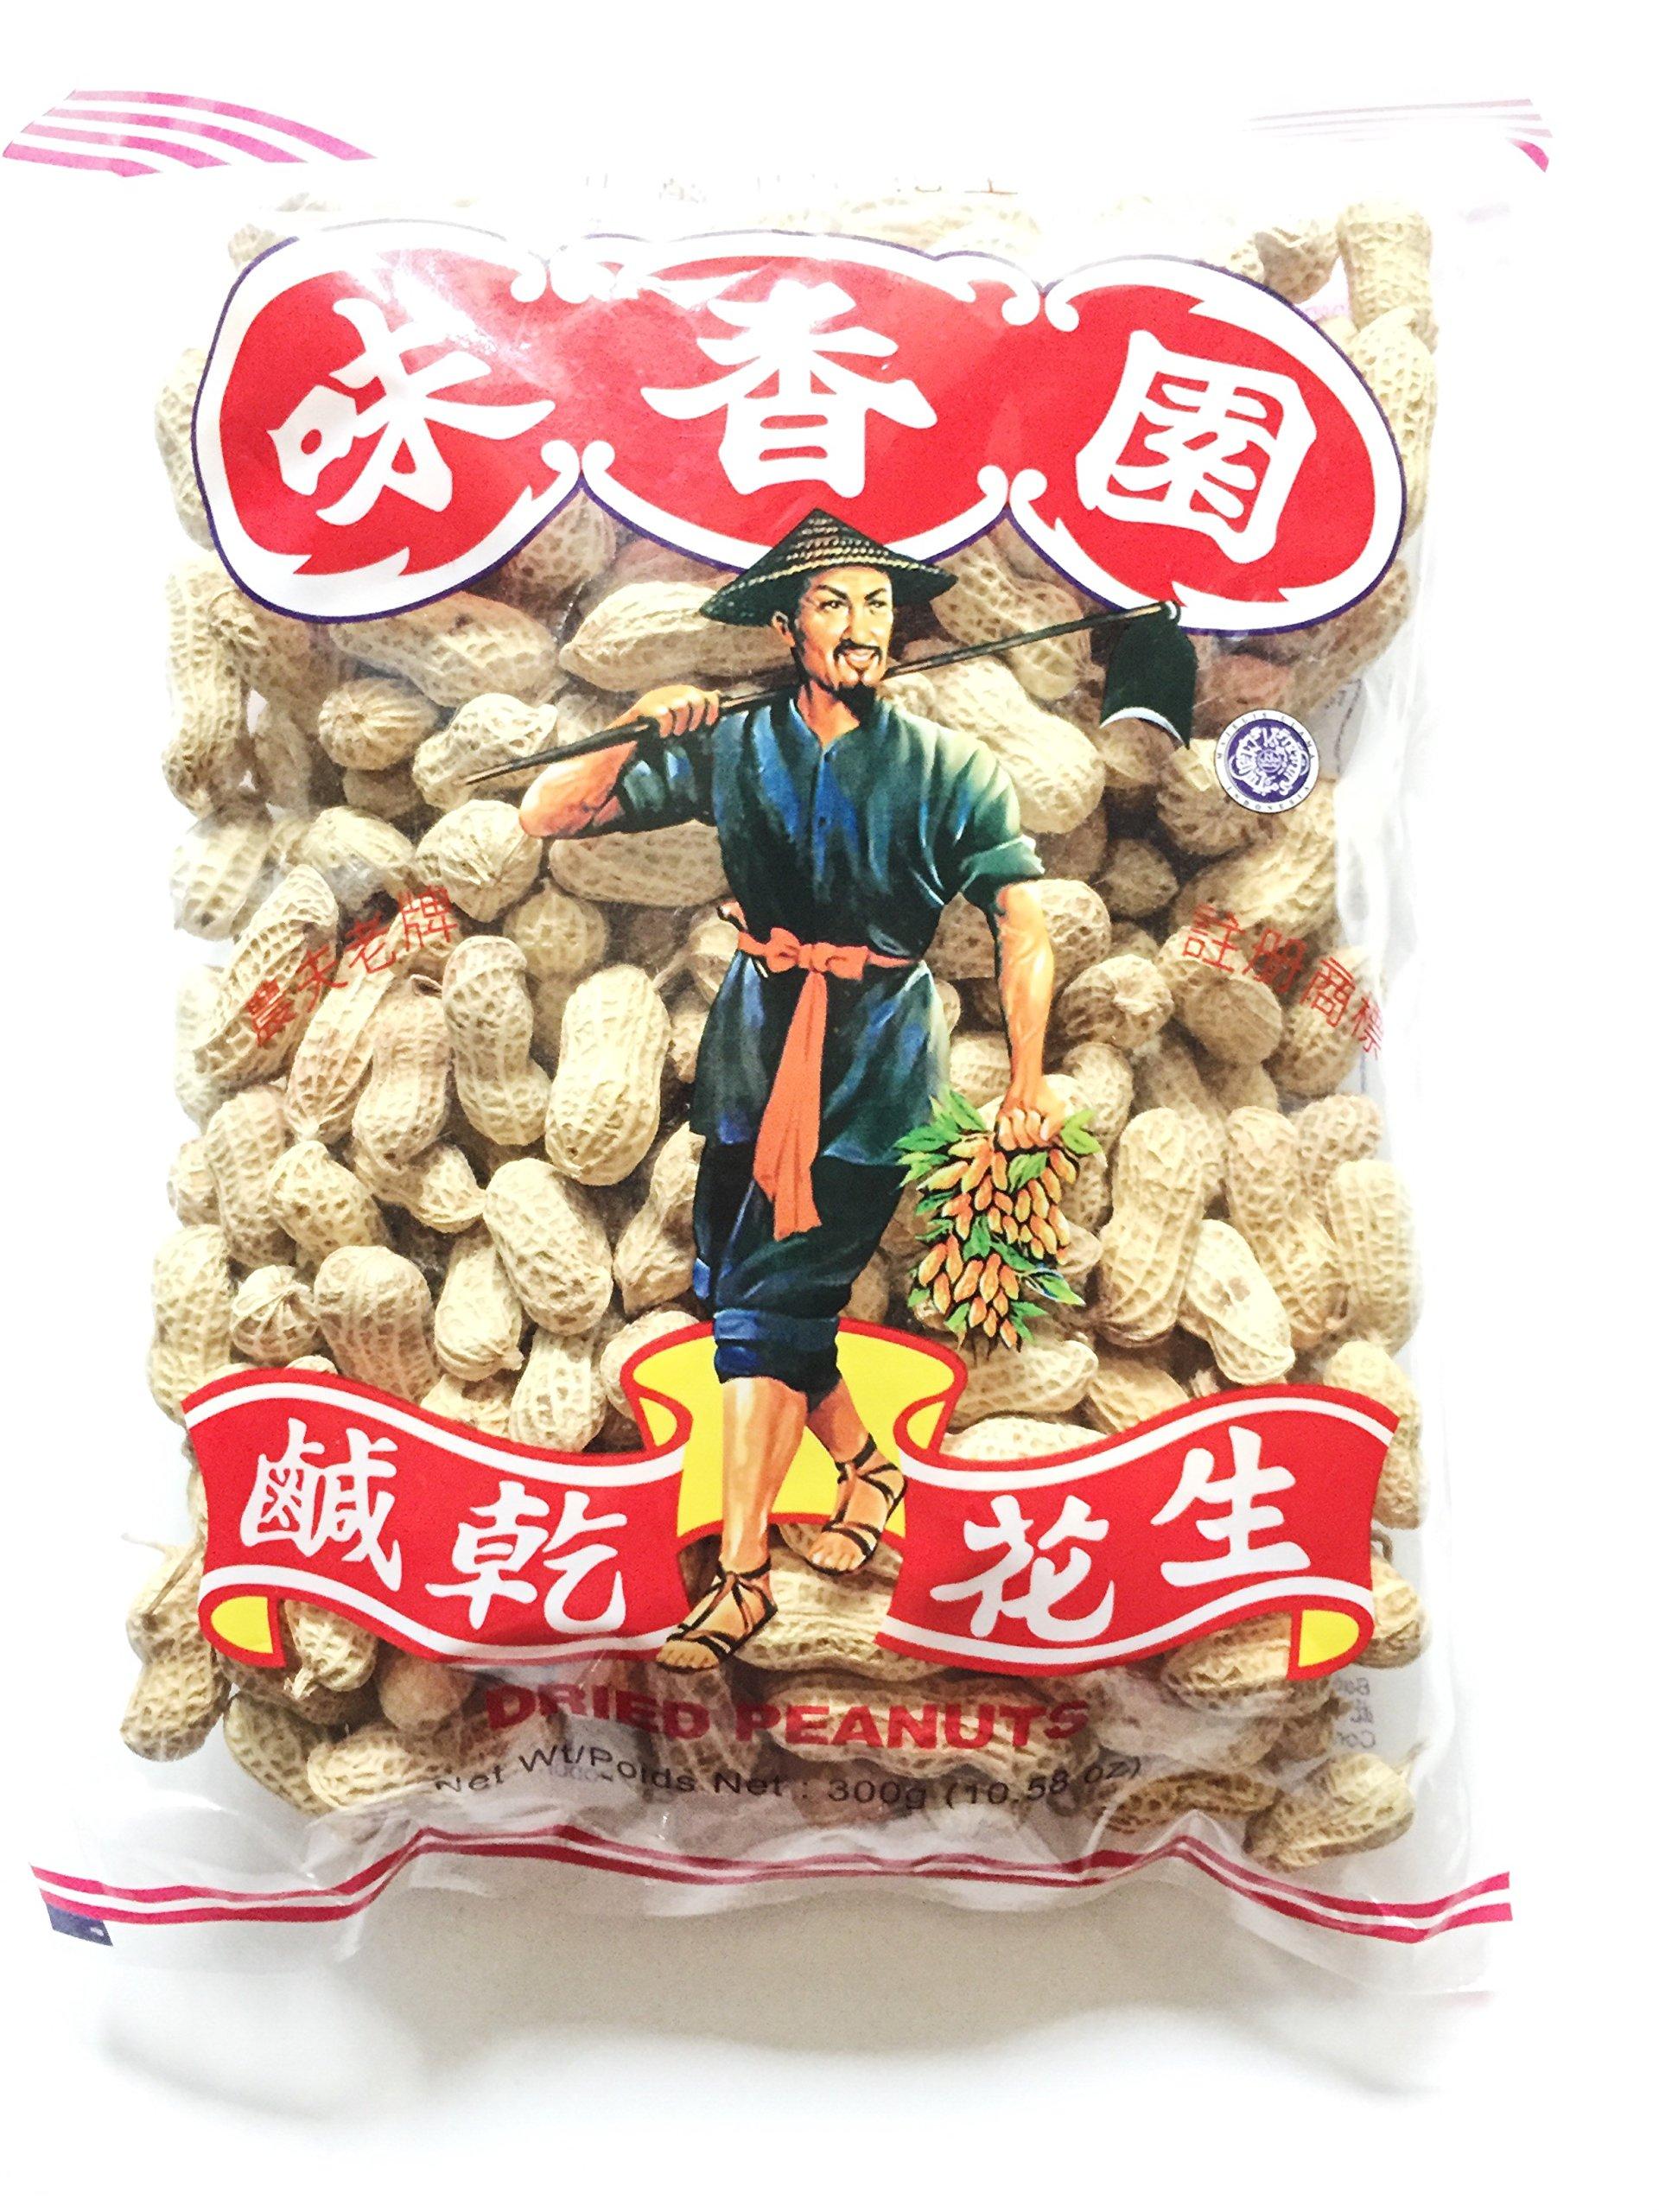 2 Pack Farmer Brand Dried & Salted Peanuts (10.58 oz each)